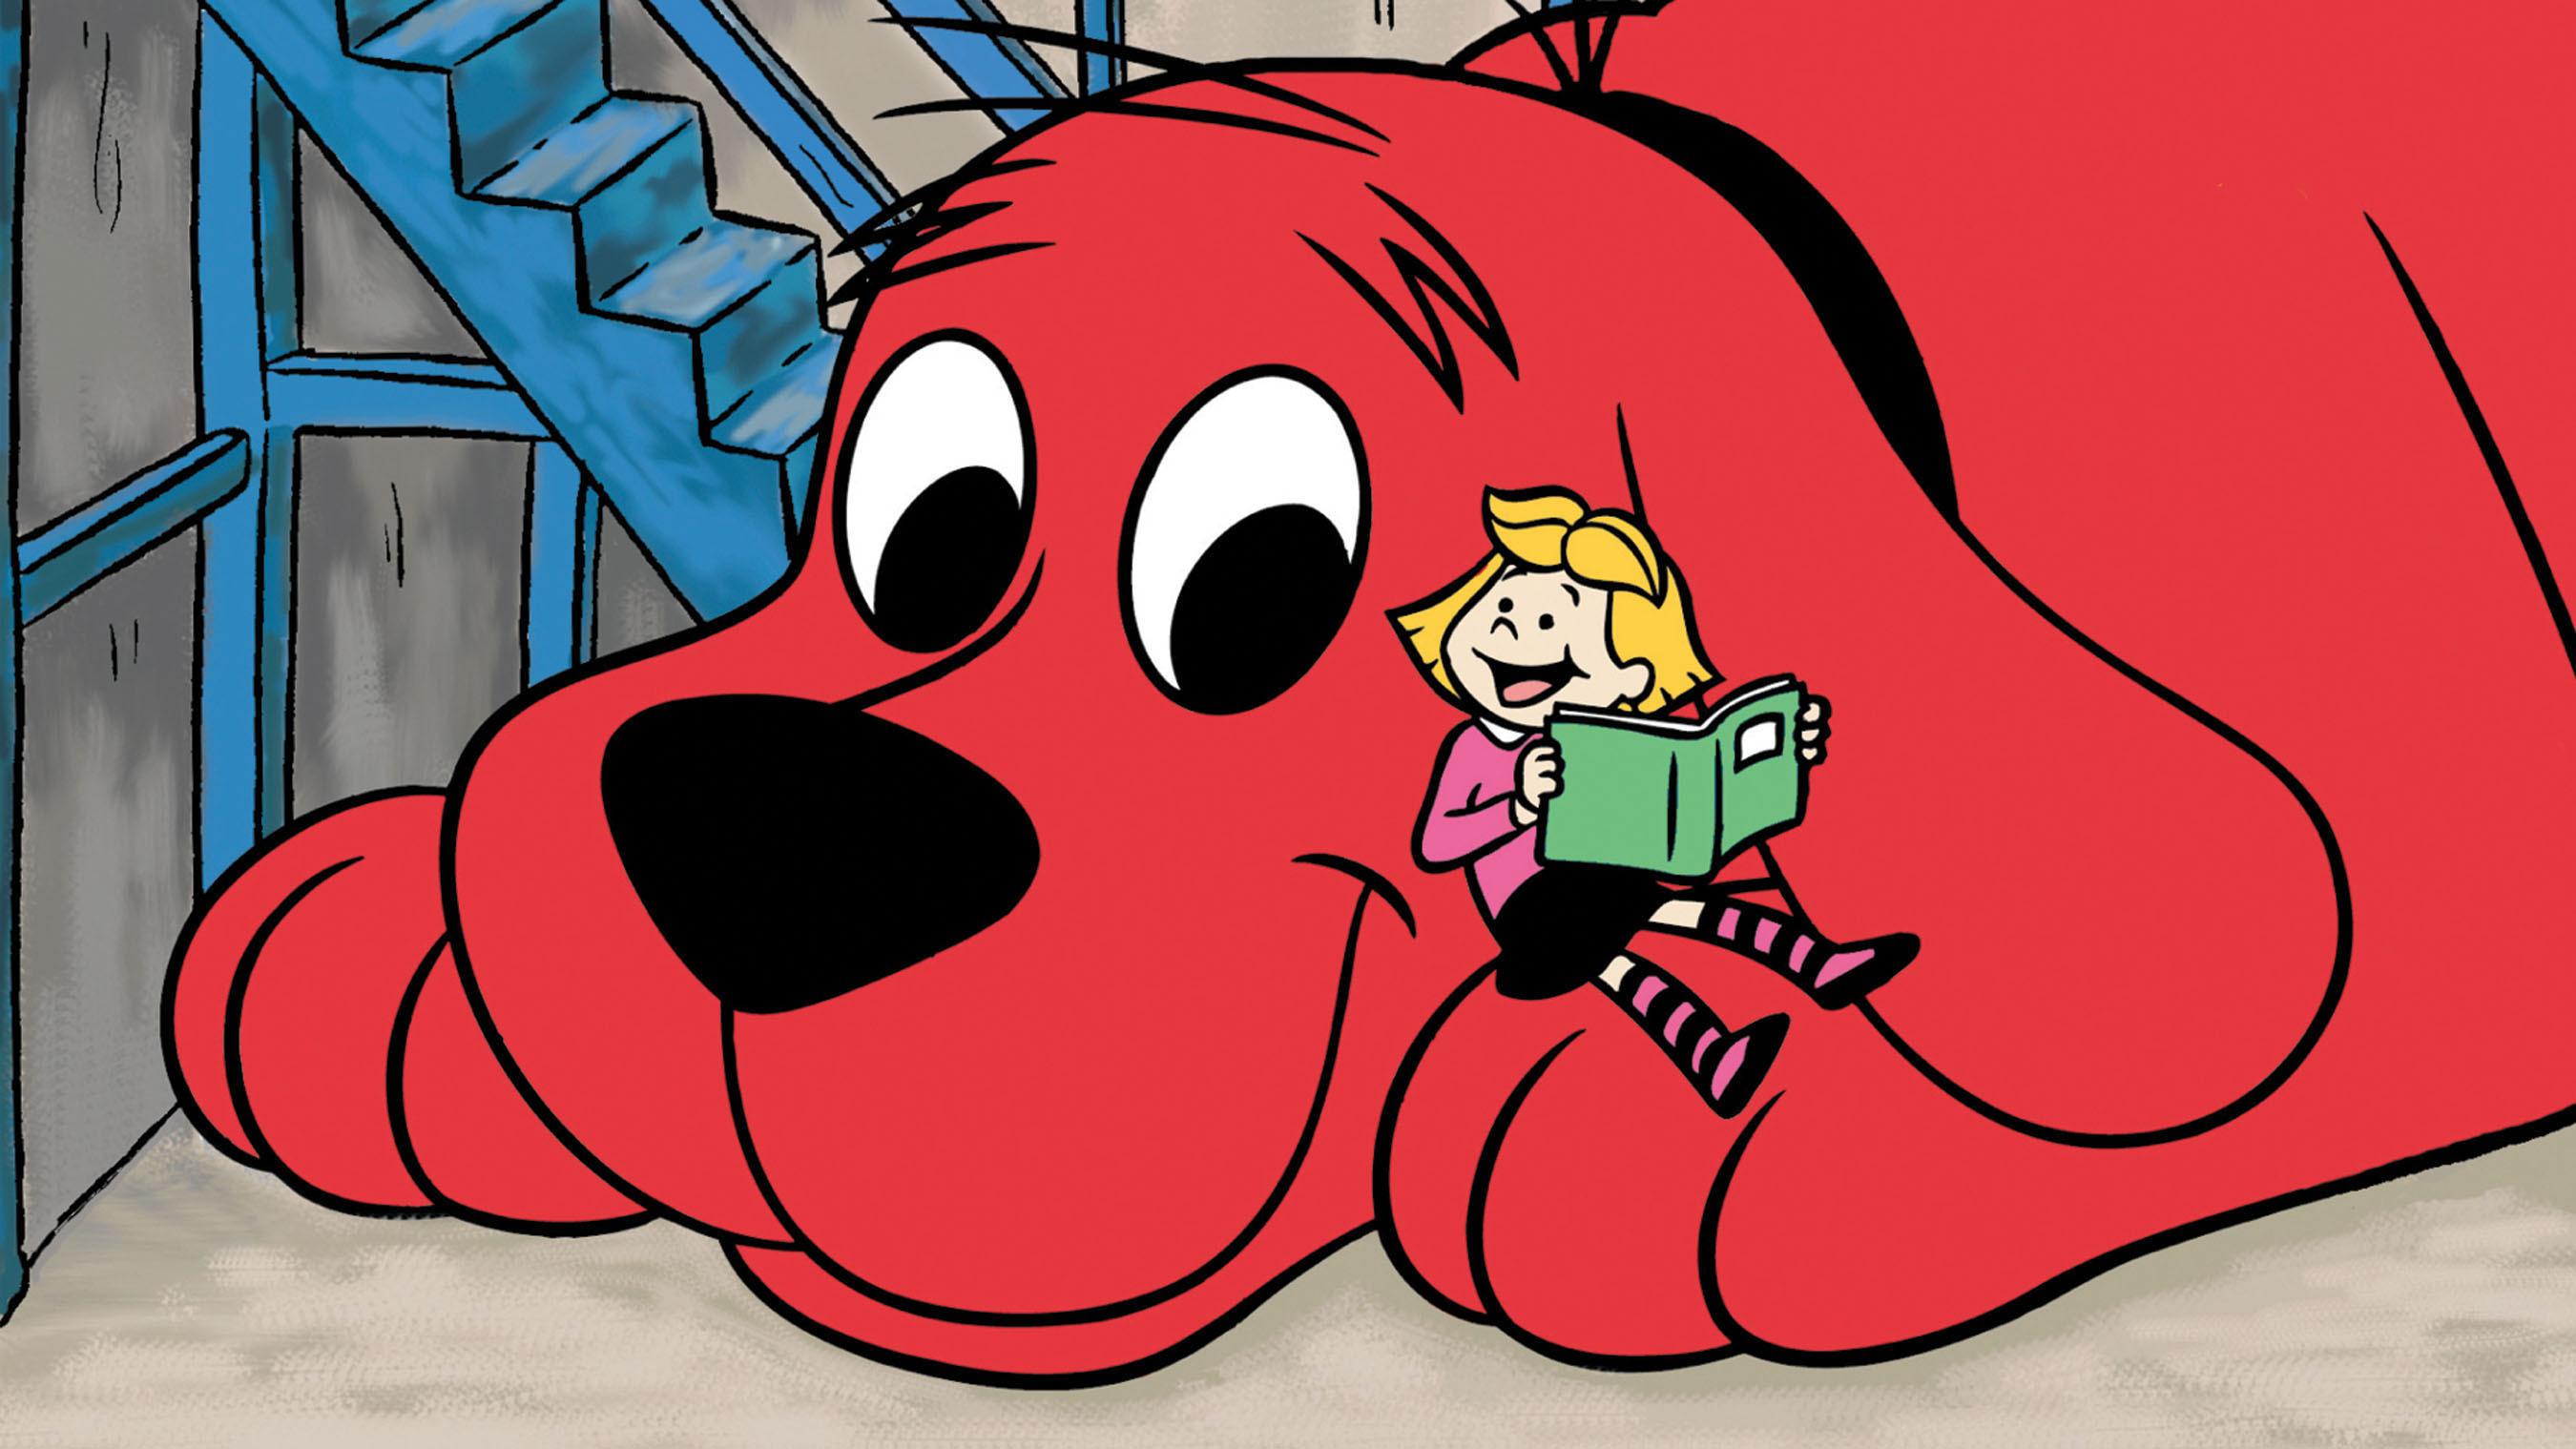 Popular children's TV series Clifford the Big Red Dog to stream on Netflix Beginning February 14. (PRNewsFoto/Netflix, Inc., Scholastic Inc. ) (PRNewsFoto/NETFLIX, INC.)